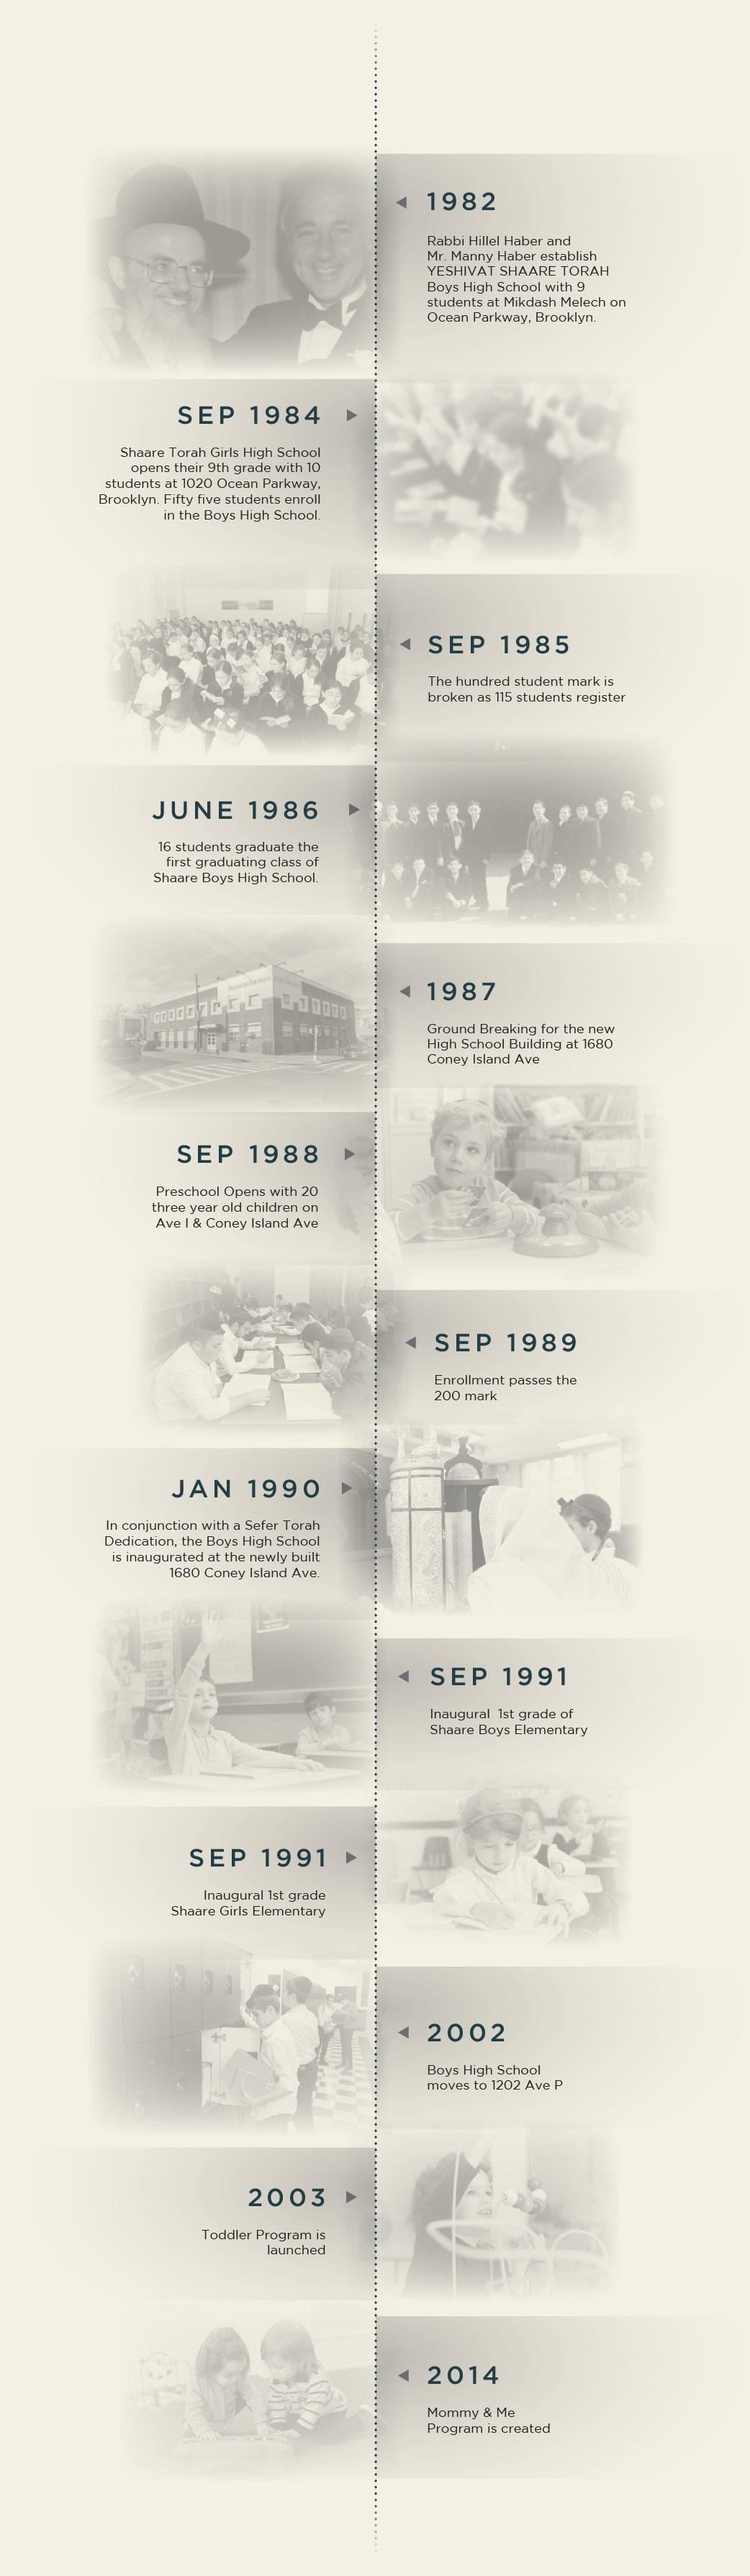 Yeshivat Shaare Torah Timeline